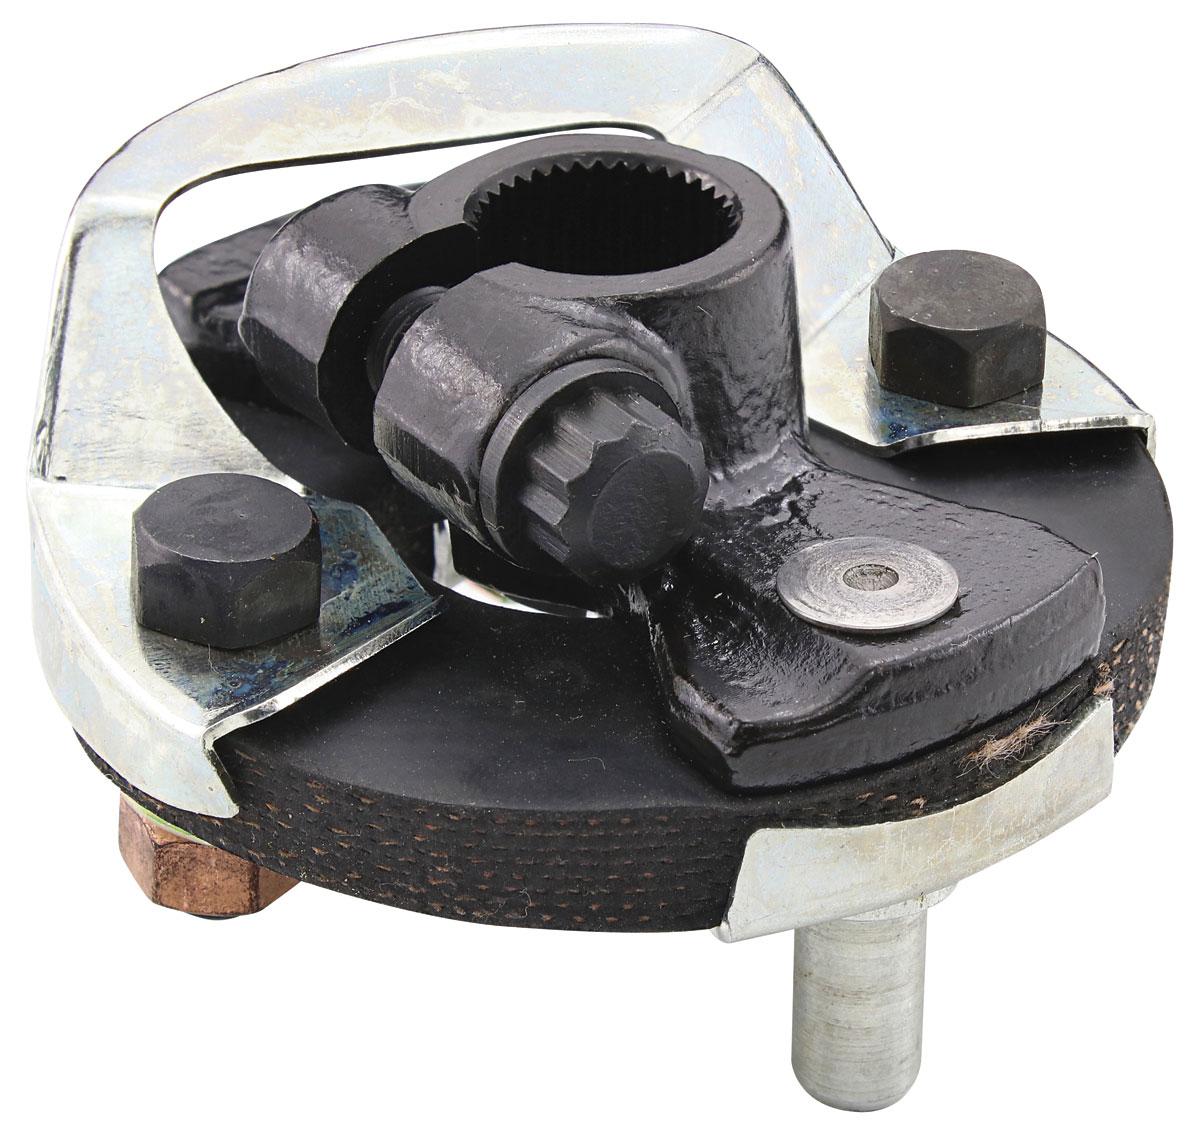 cpp 1964 72 chevelle steering box coupler manual 3 4 36 spline rh opgi com Chevy Power Steering Pump Installation Power Steering Hose Repair Kit